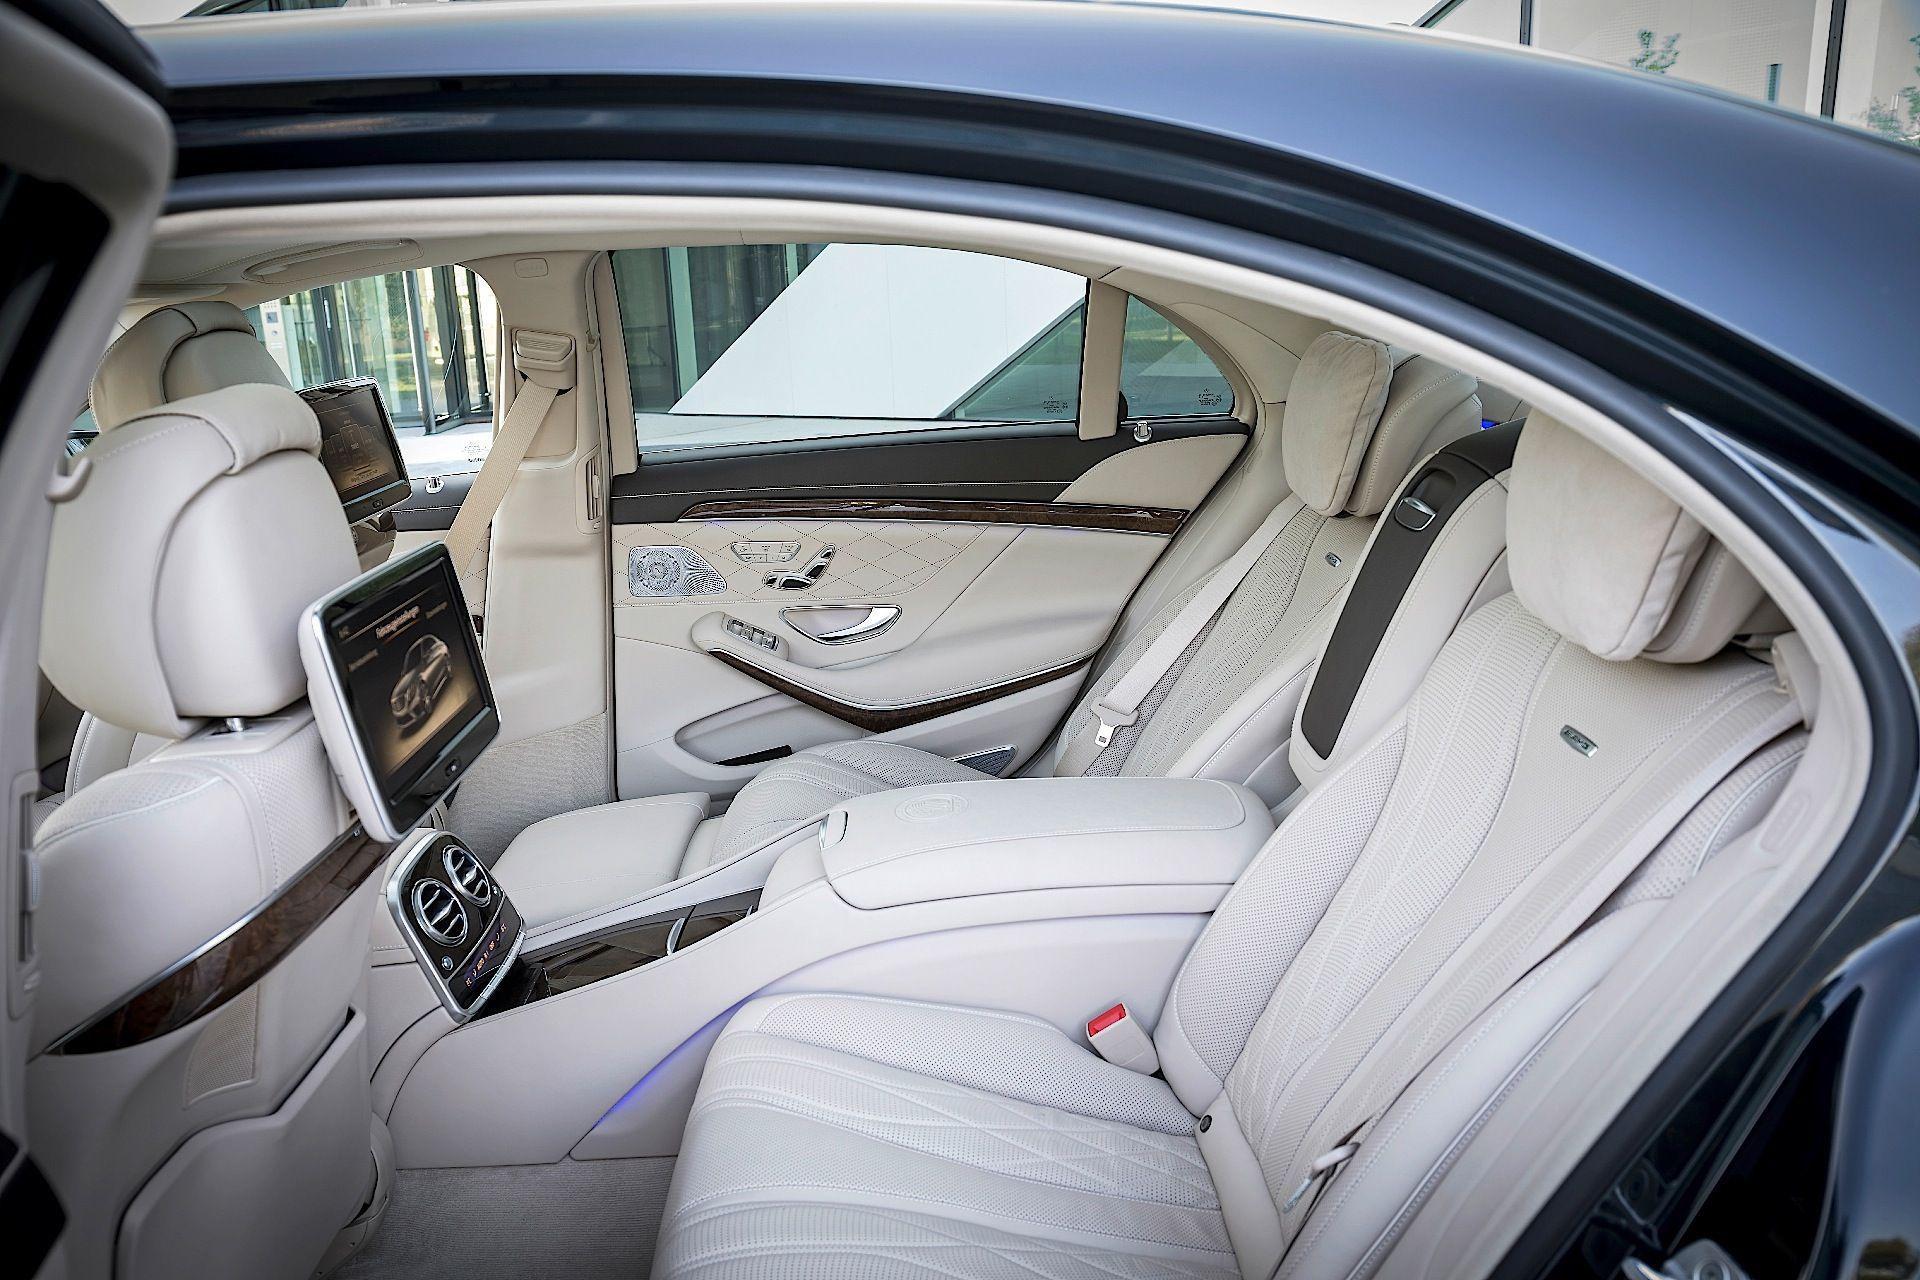 Mercedes Benz S65 Amg Full Hd